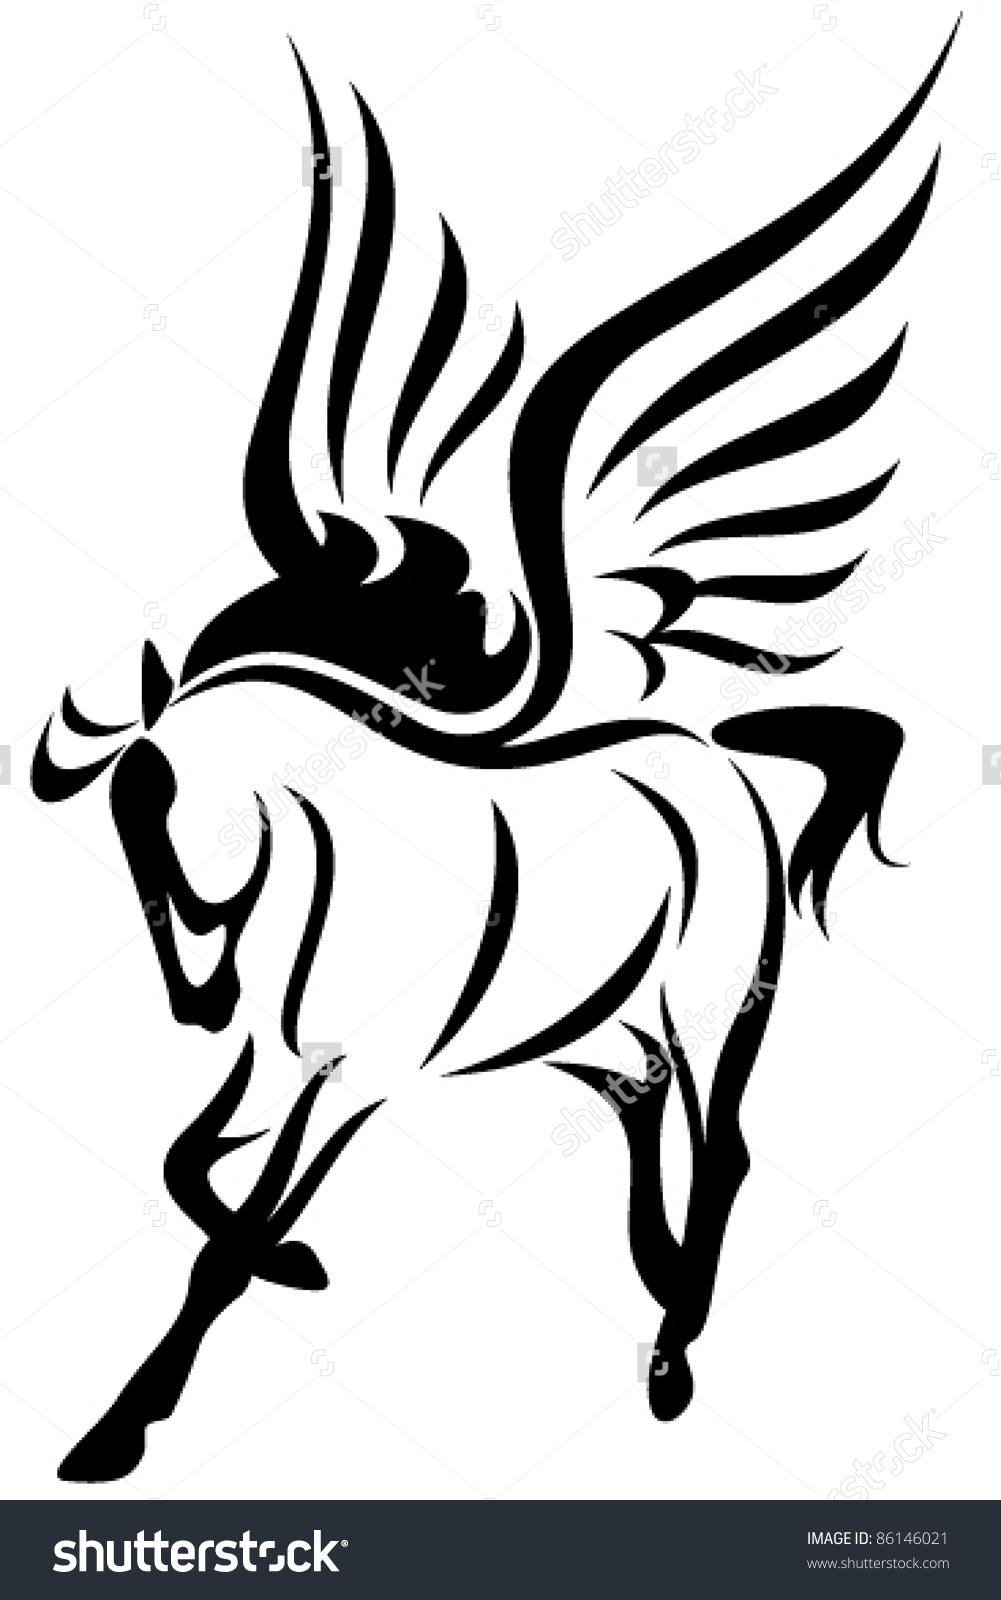 Pegasus Winged Horse Vector Illustration Symbol Stock Vector.